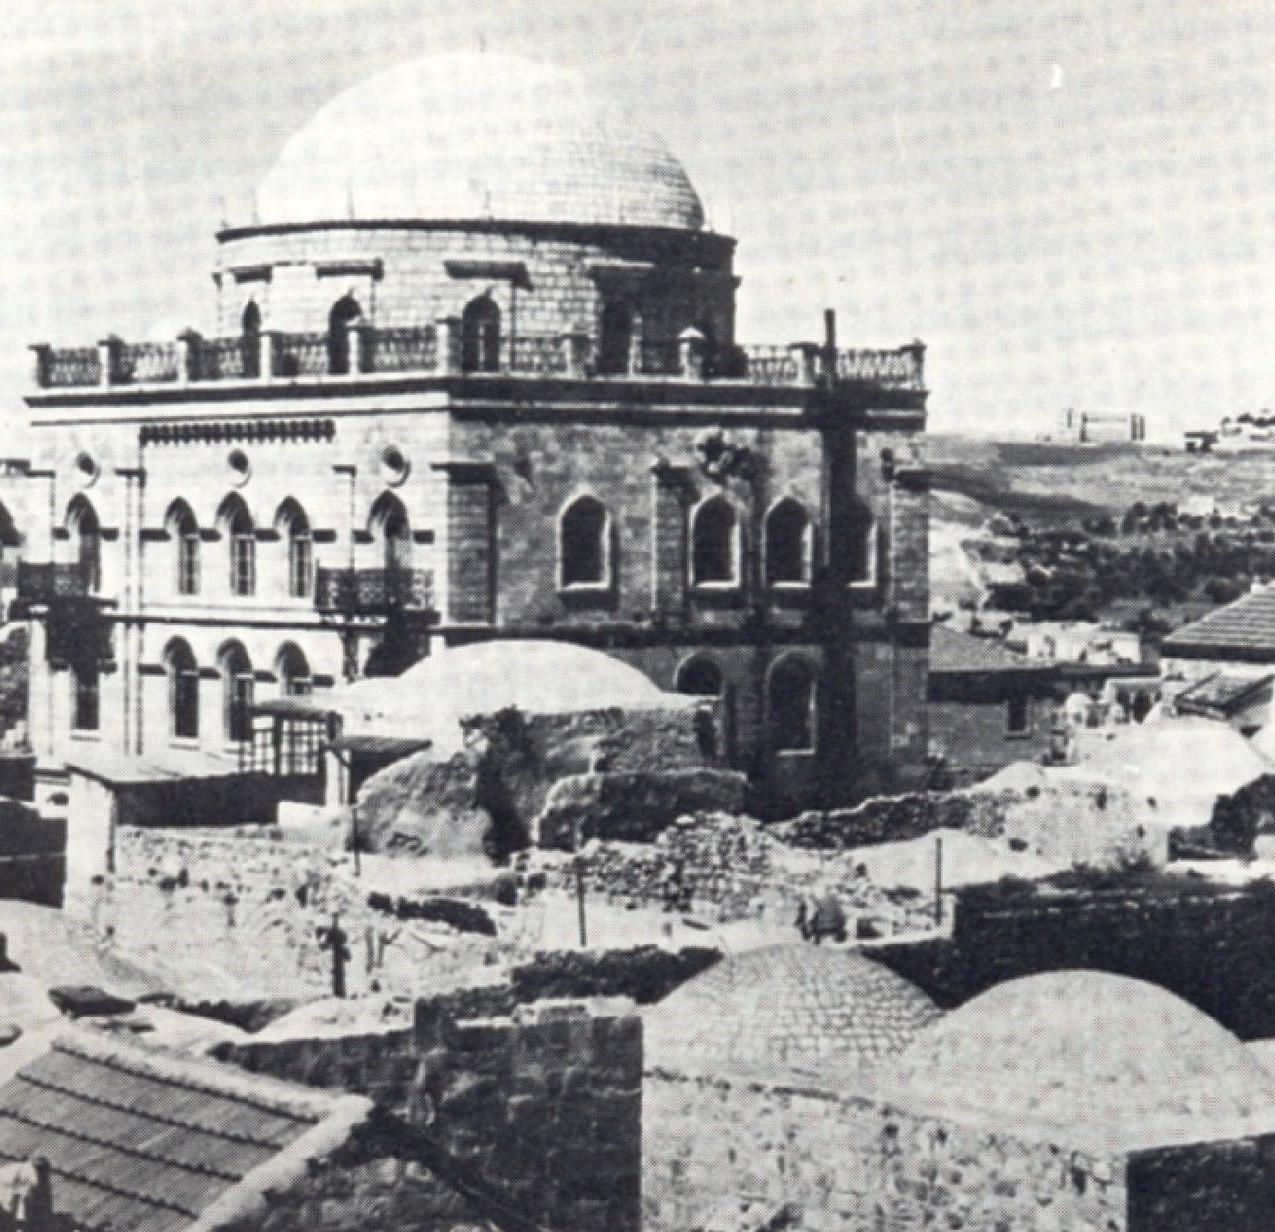 Tiferet Iisrael Synagogue